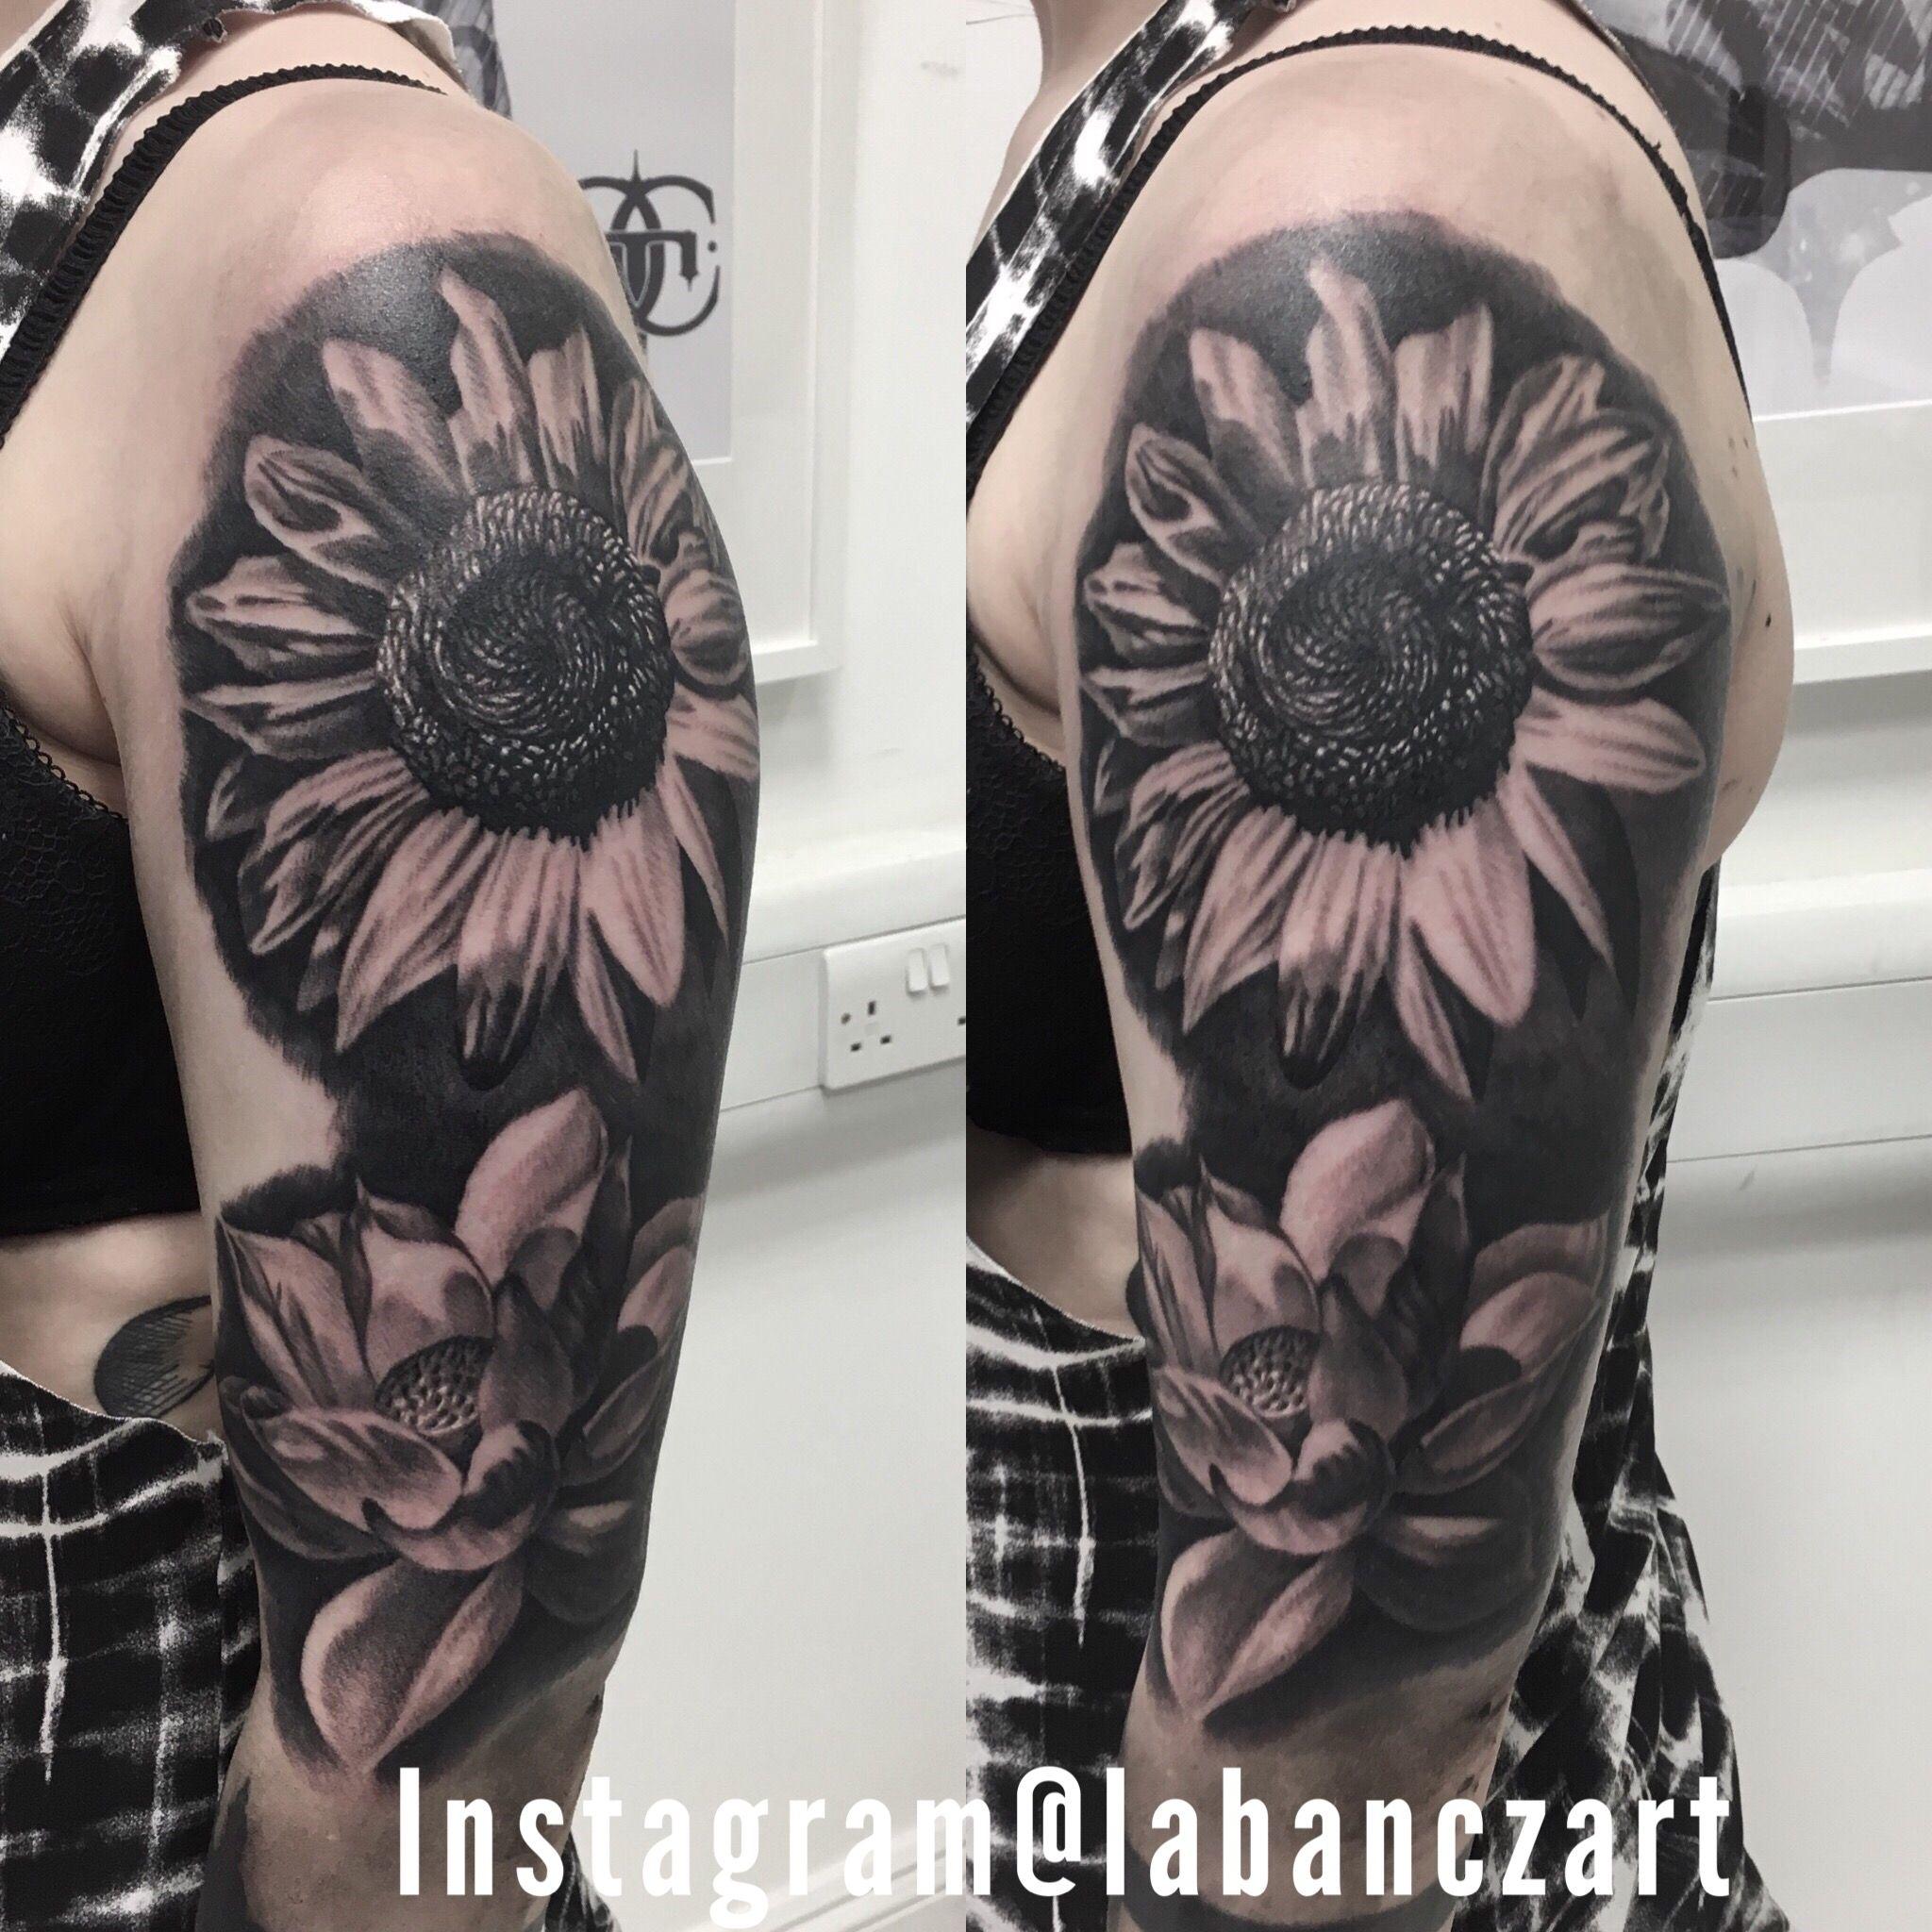 Tattoo by labanczart uk instagram labanczart etsyshop tattoo by labanczart uk instagram labanczart etsyshop izmirmasajfo